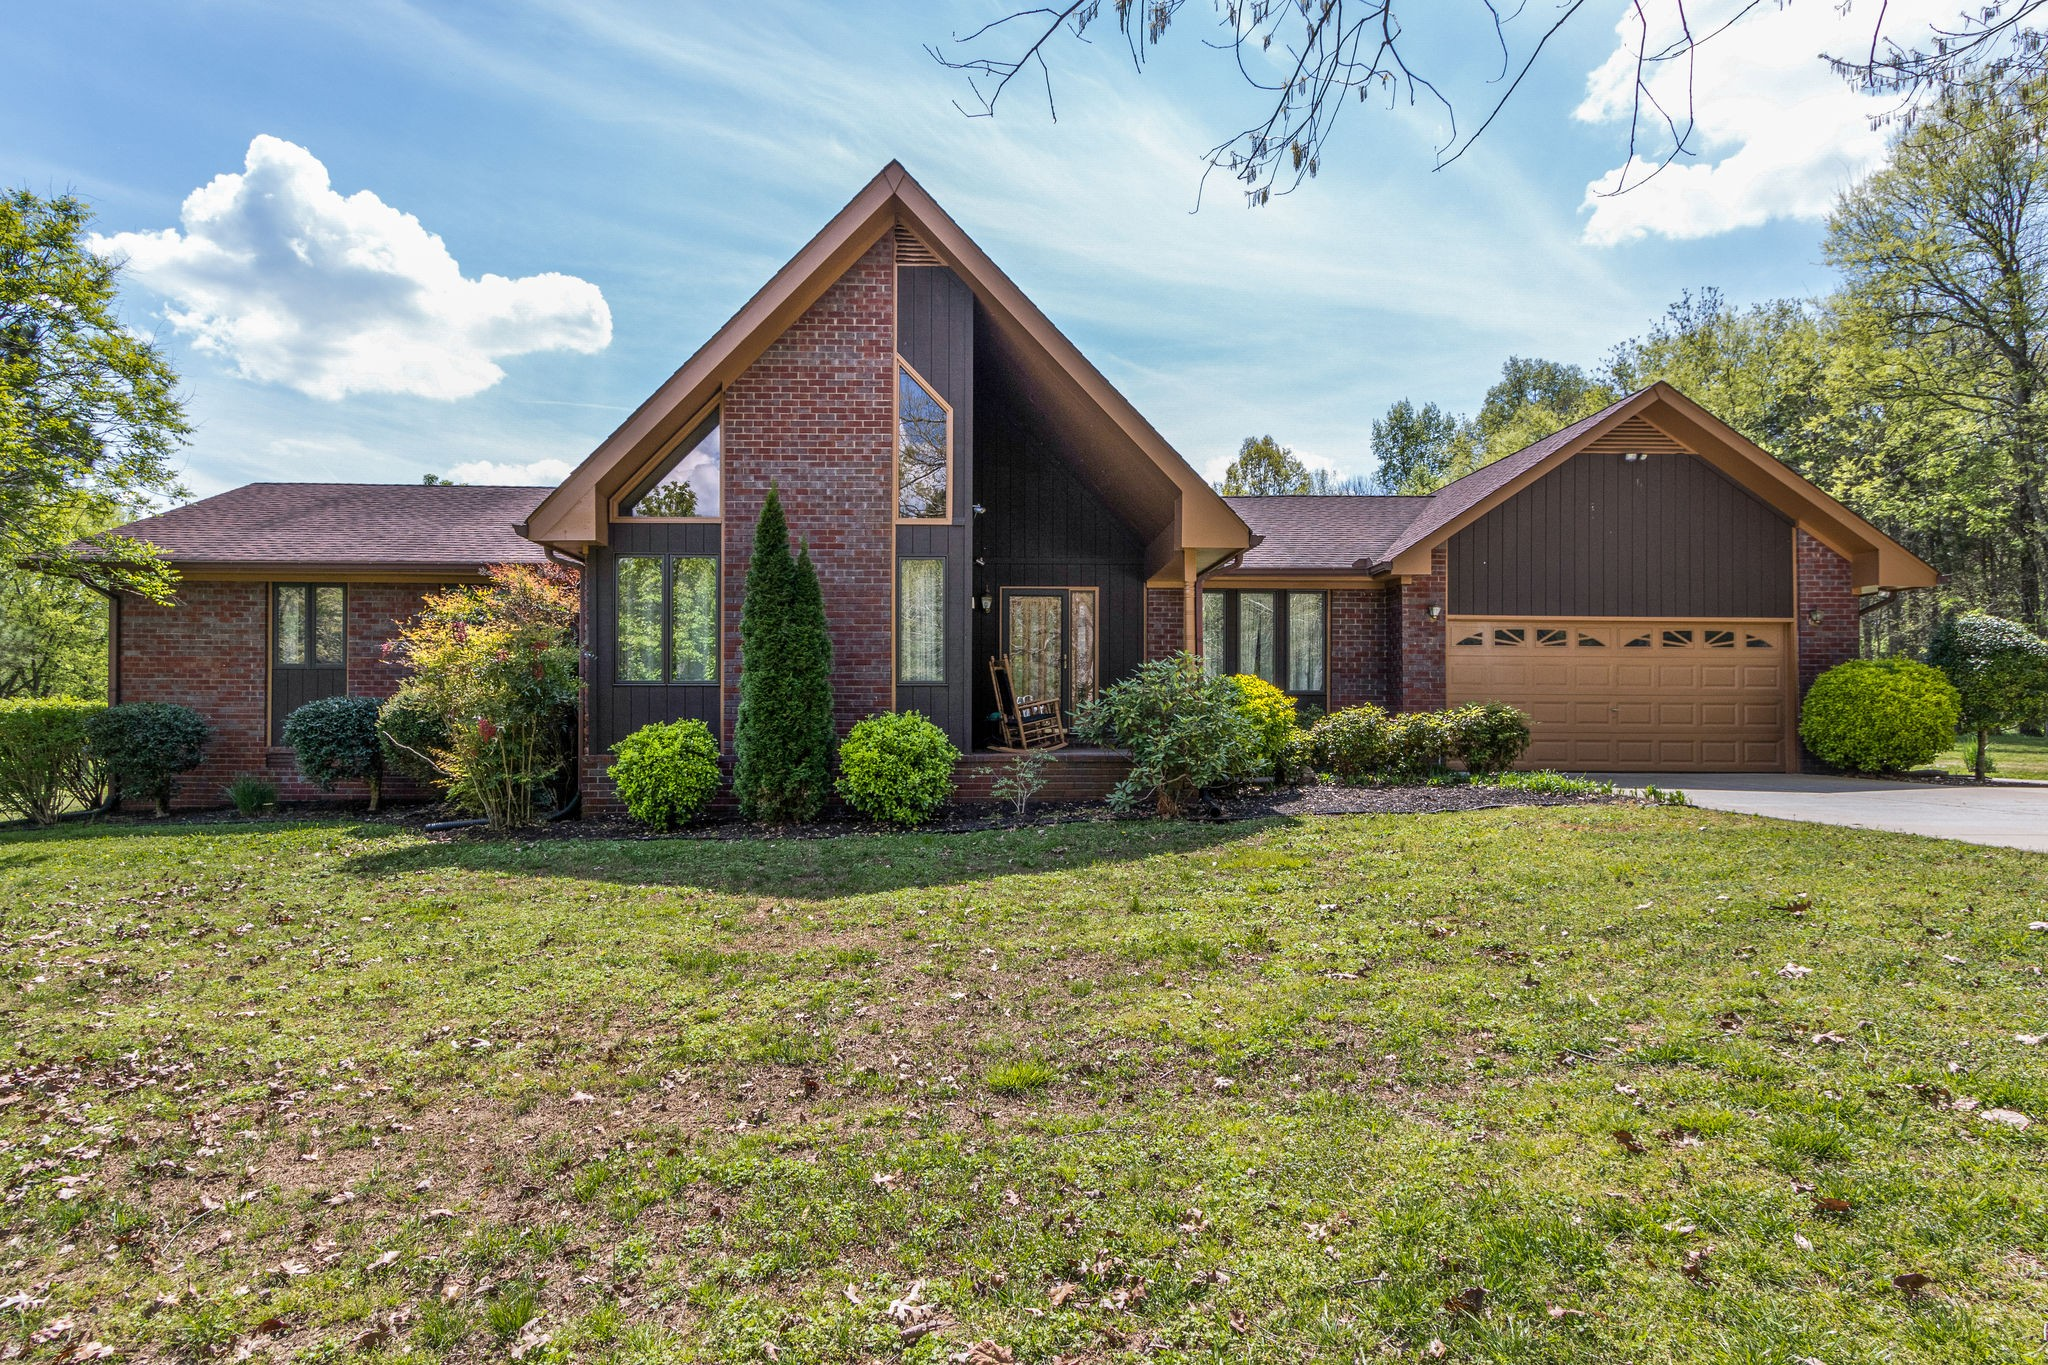 2231 North Rd, Murfreesboro, TN 37128 - Murfreesboro, TN real estate listing